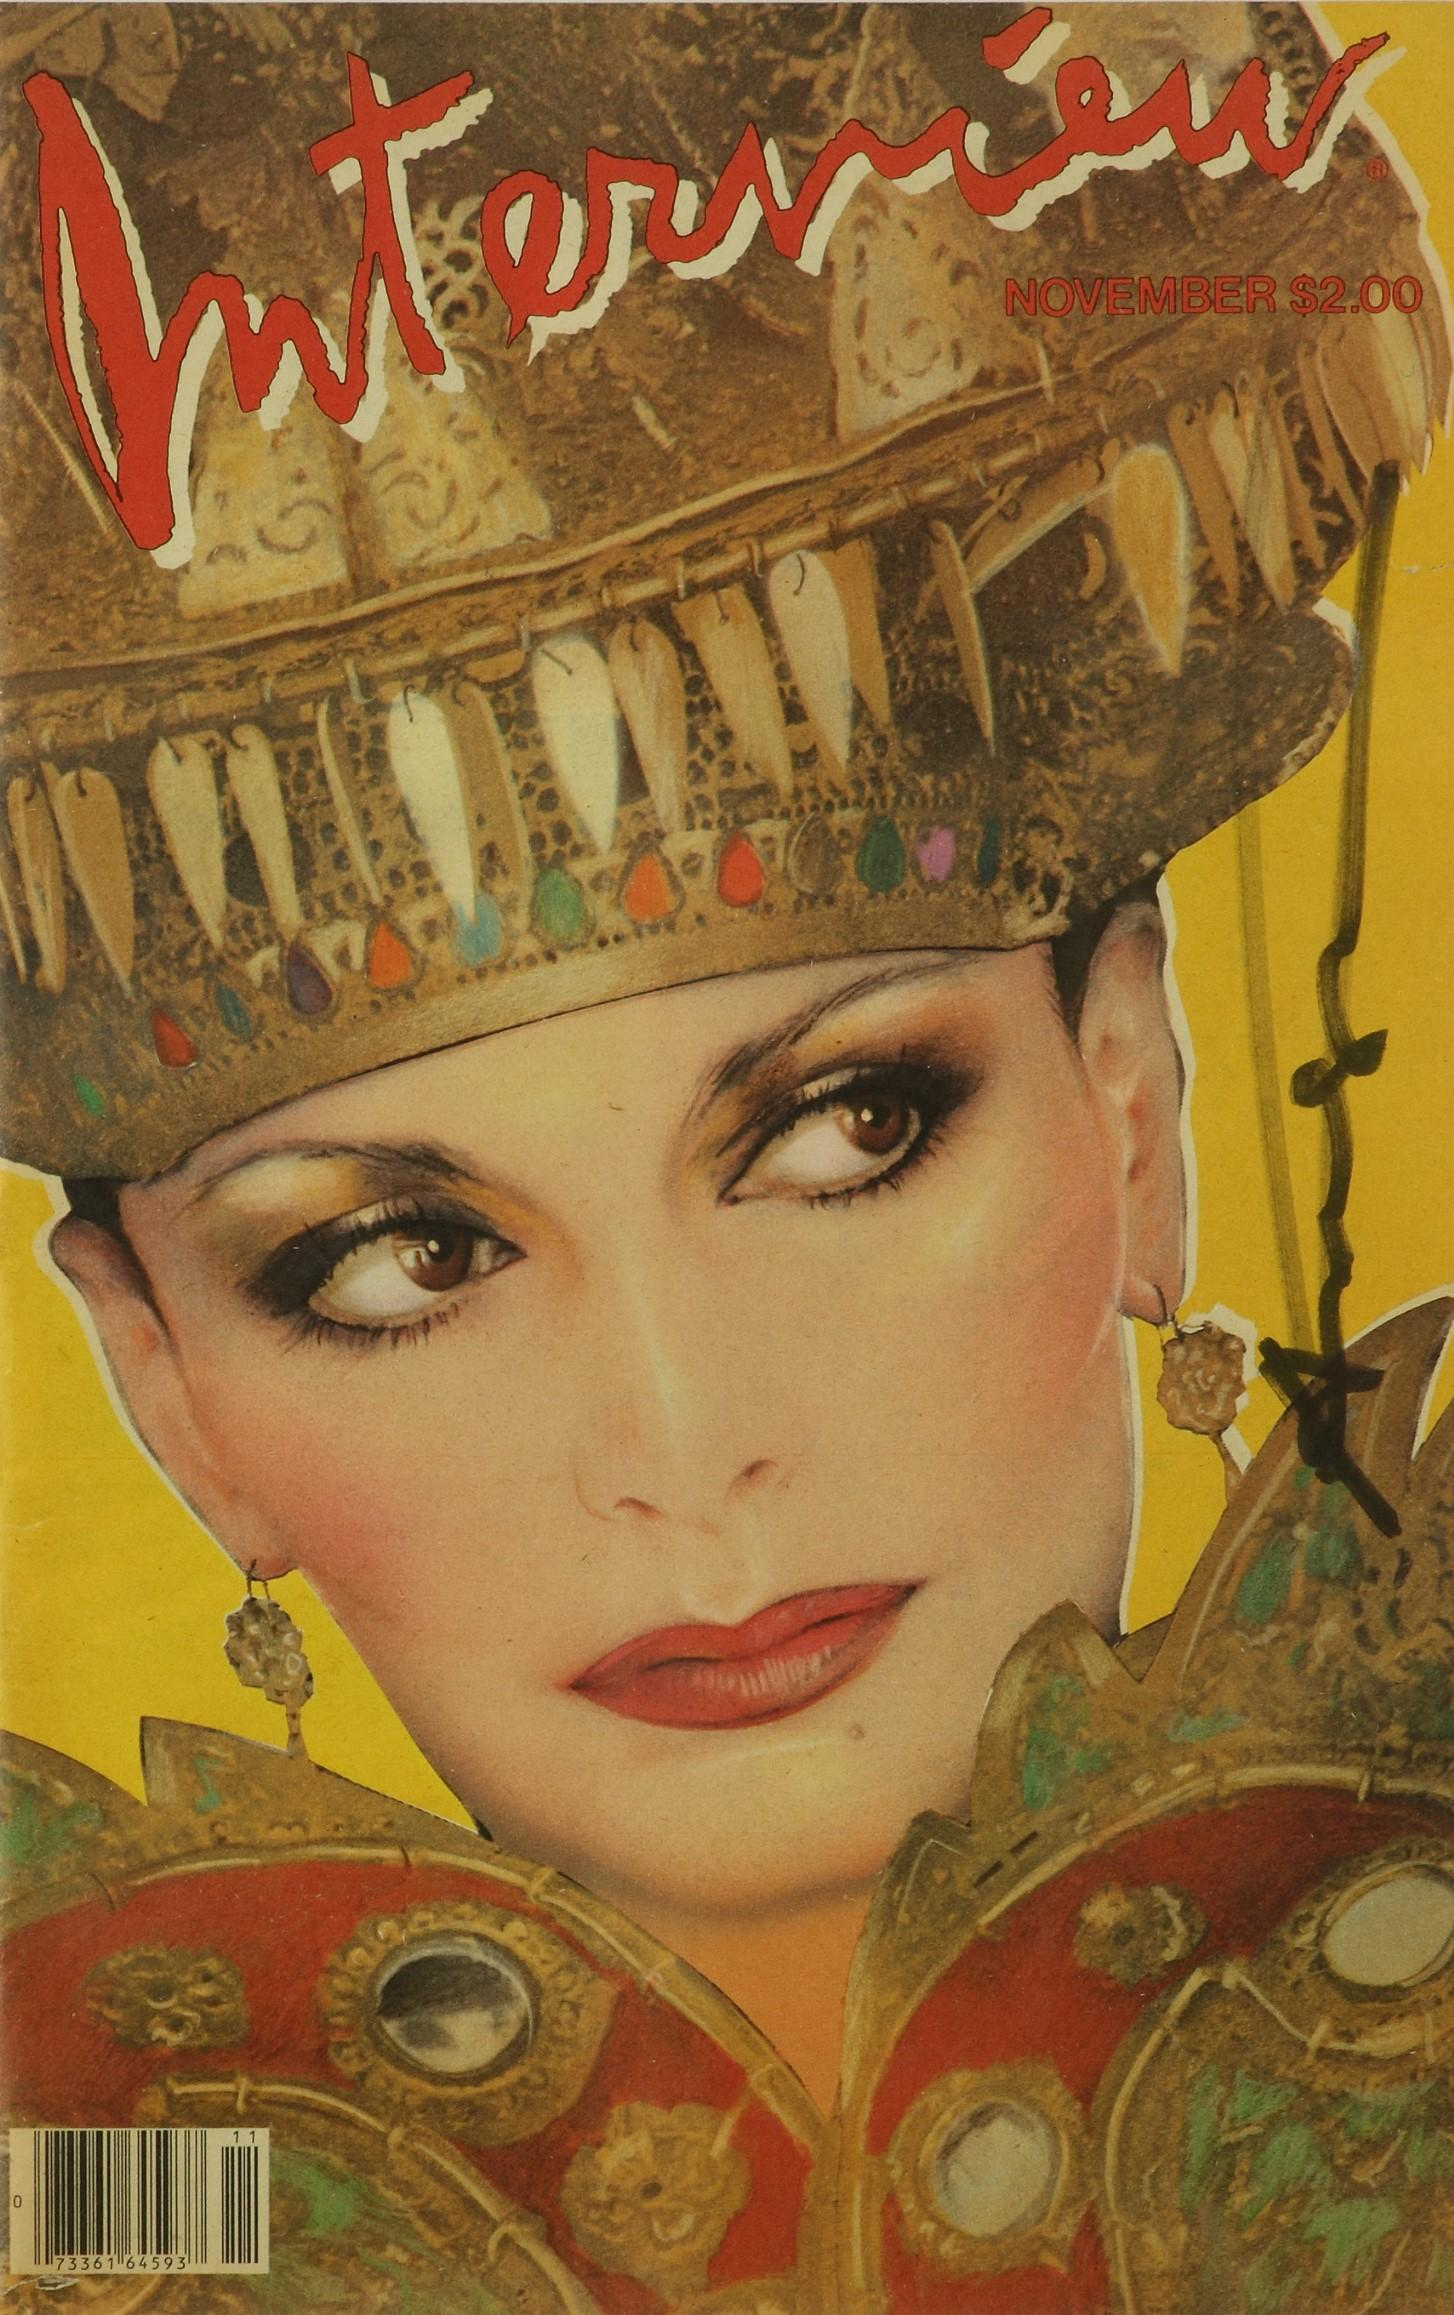 Diane Von Furstenberg Interview Cover, Signed By Andy Warhol, American, Pop Art